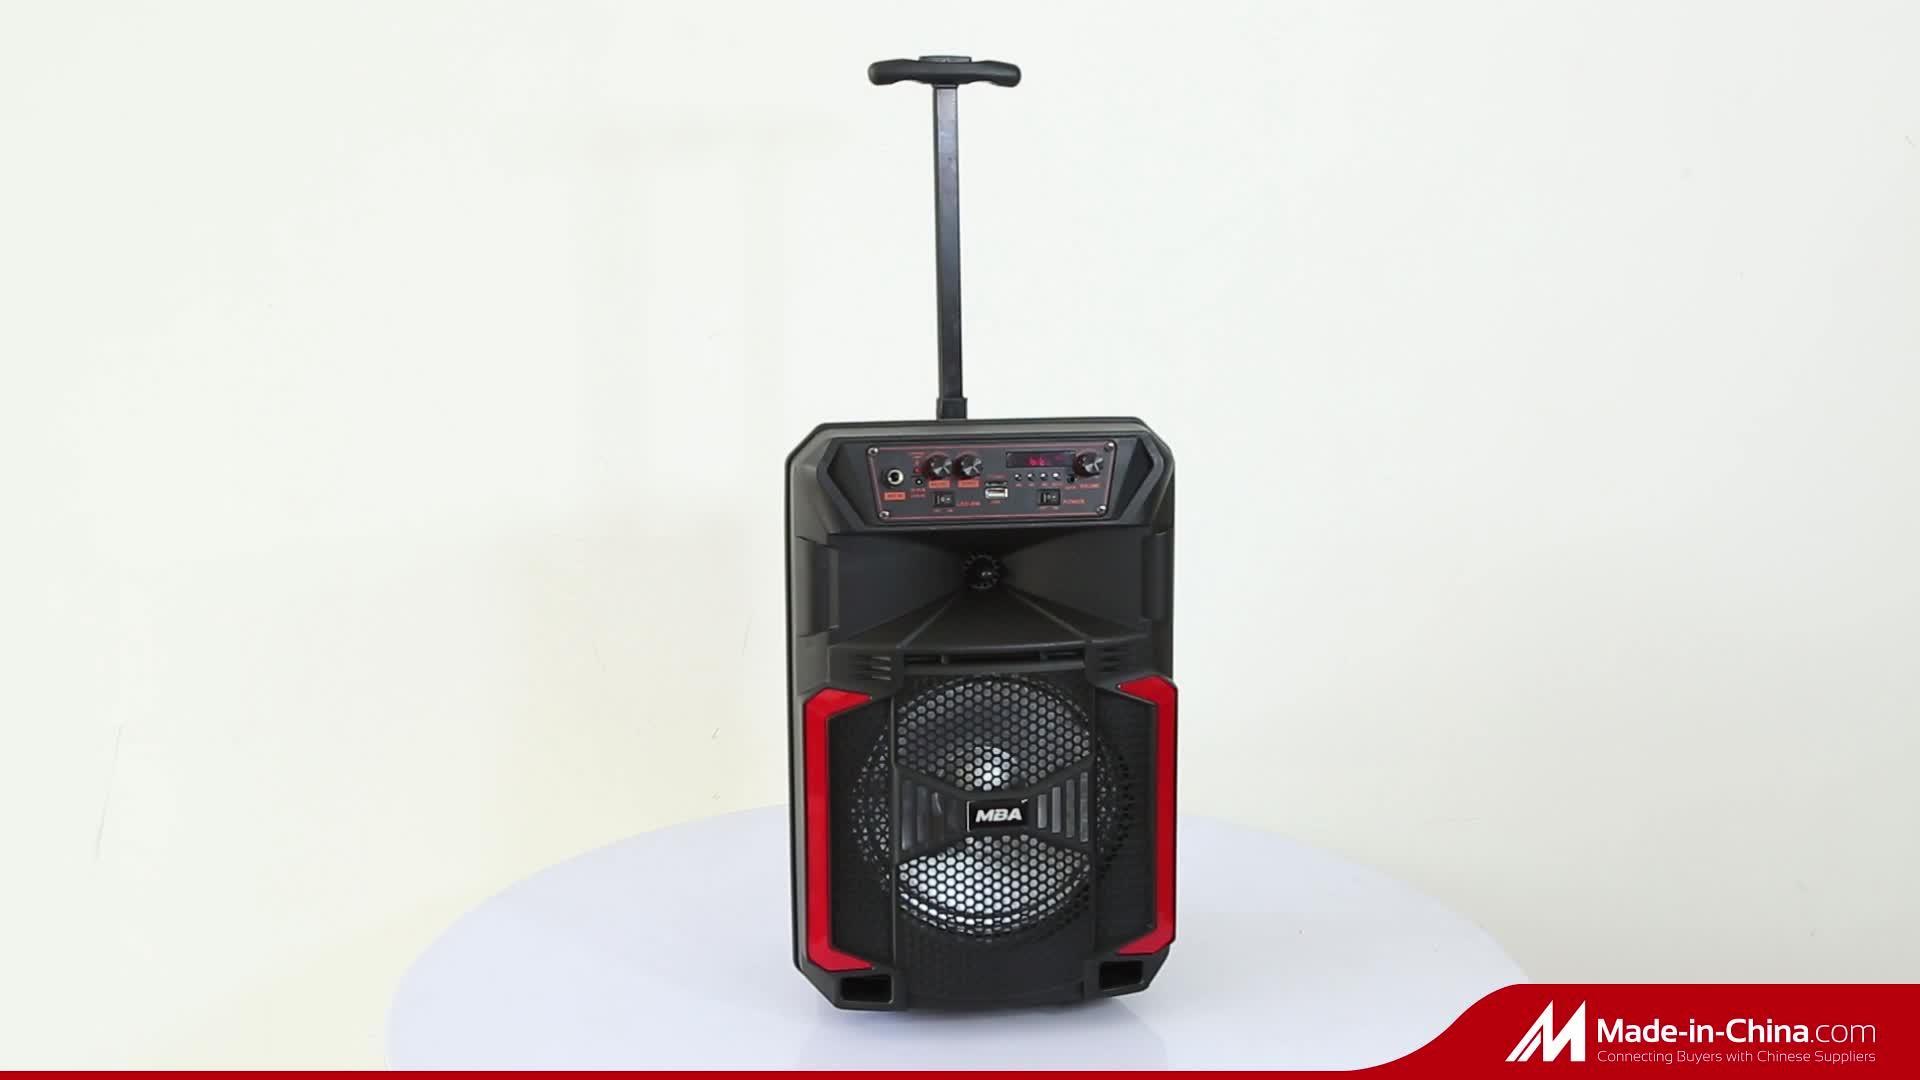 8 Cm Neues Tragbares Home Entertainment-System Mini Karaoke Kabelloses Bluetooth Karaoke Mikrofon-Lautsprecher Mit Lautem Trolley-Audio